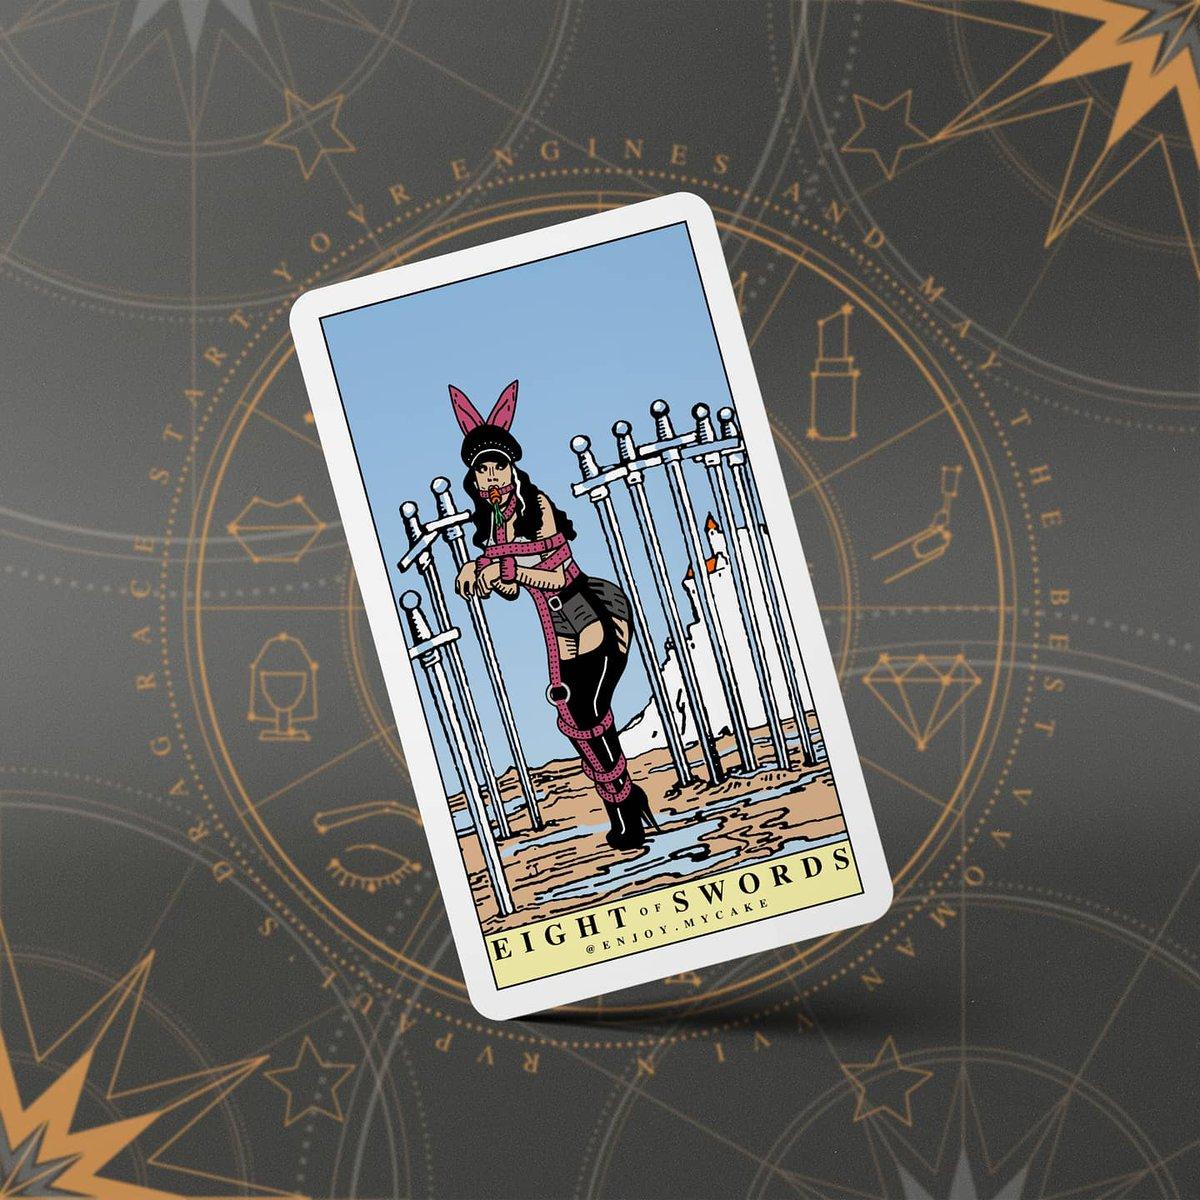 I'm turning RuPaul's Drag Race queens into tarot cards.   Manila Luzon as Eight of Swords   @manilaluzon #tarot #dragrace https://t.co/sl2sa8uQOw